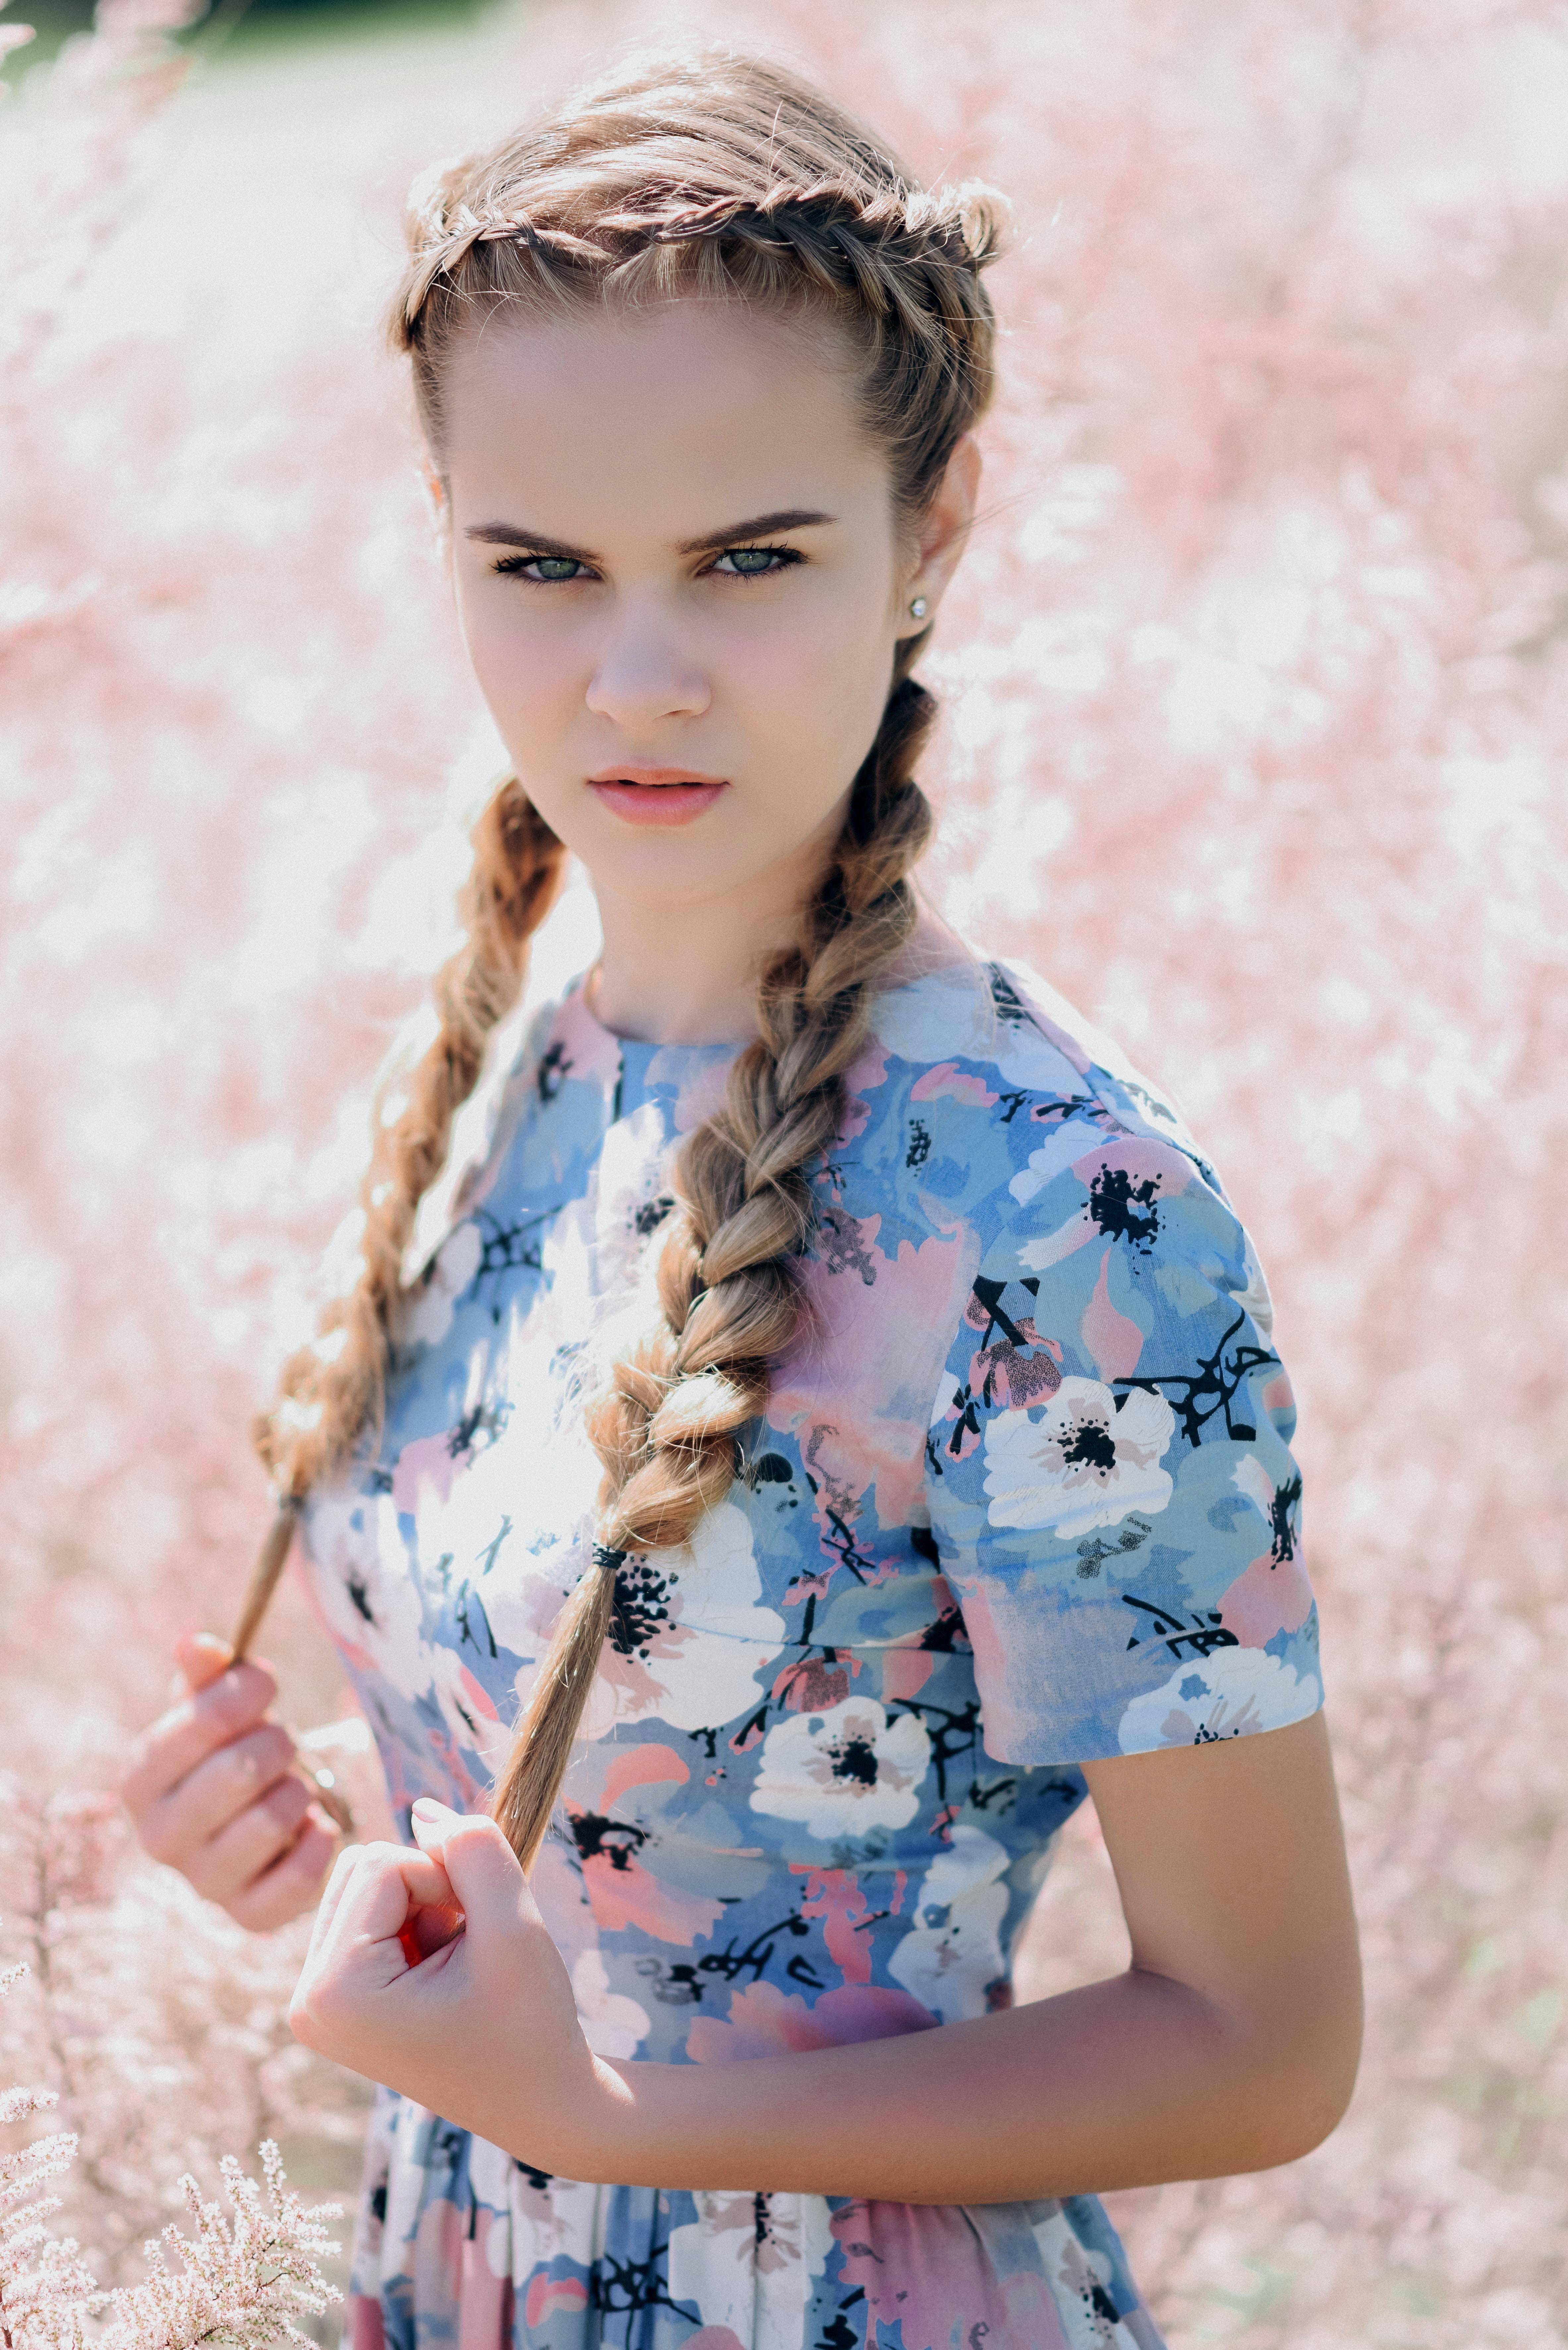 Free stock photo of baby girl, beautiful flowers, beautiful girl, fashion photography